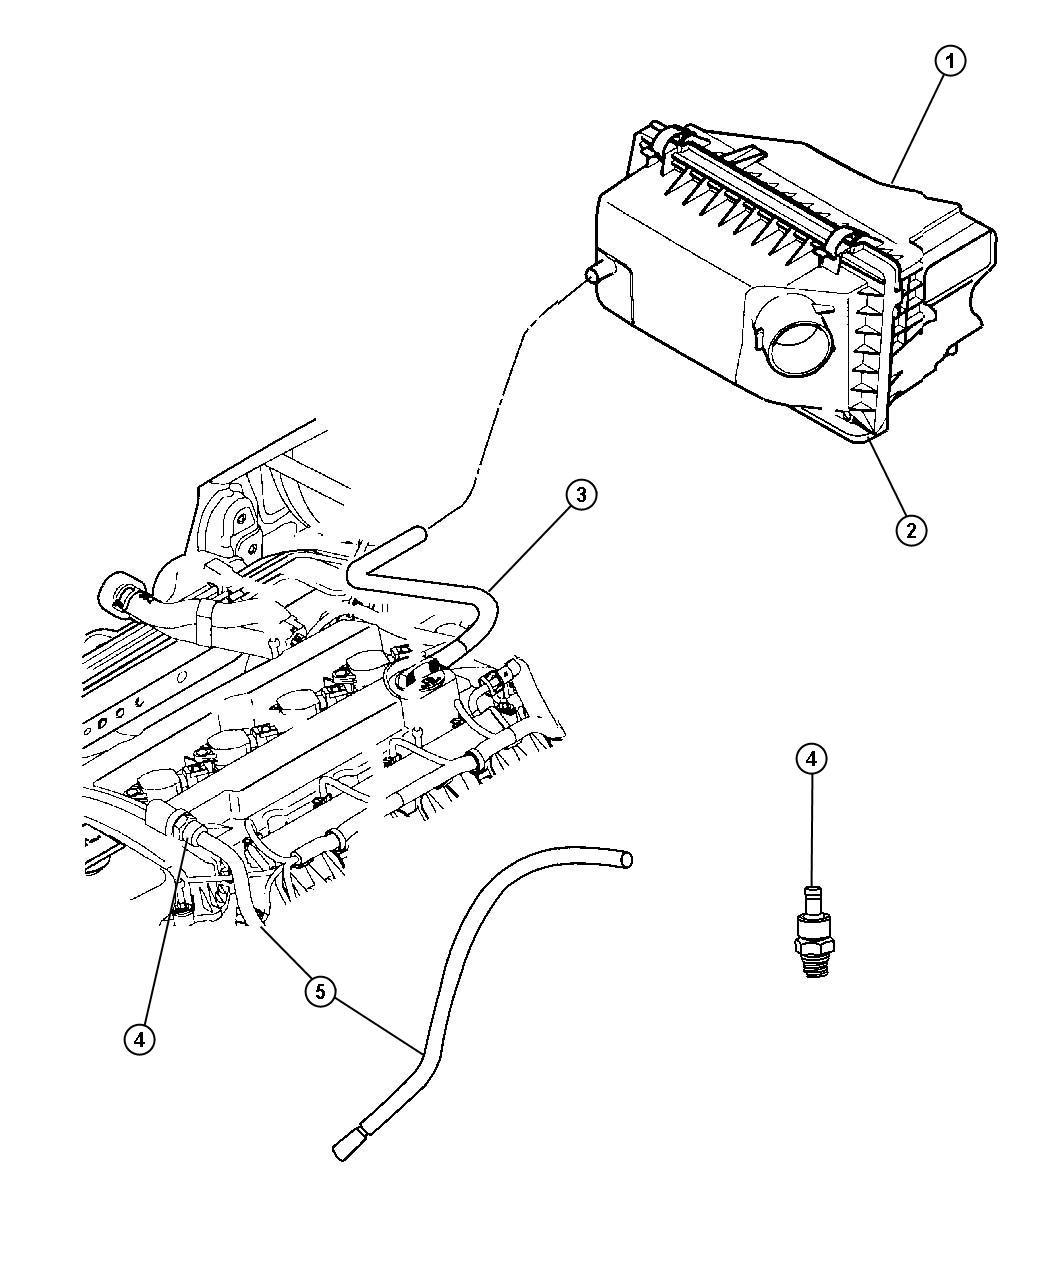 2007 Jeep Patriot Hose. Pcv, pcv valve. With 15mm nipple